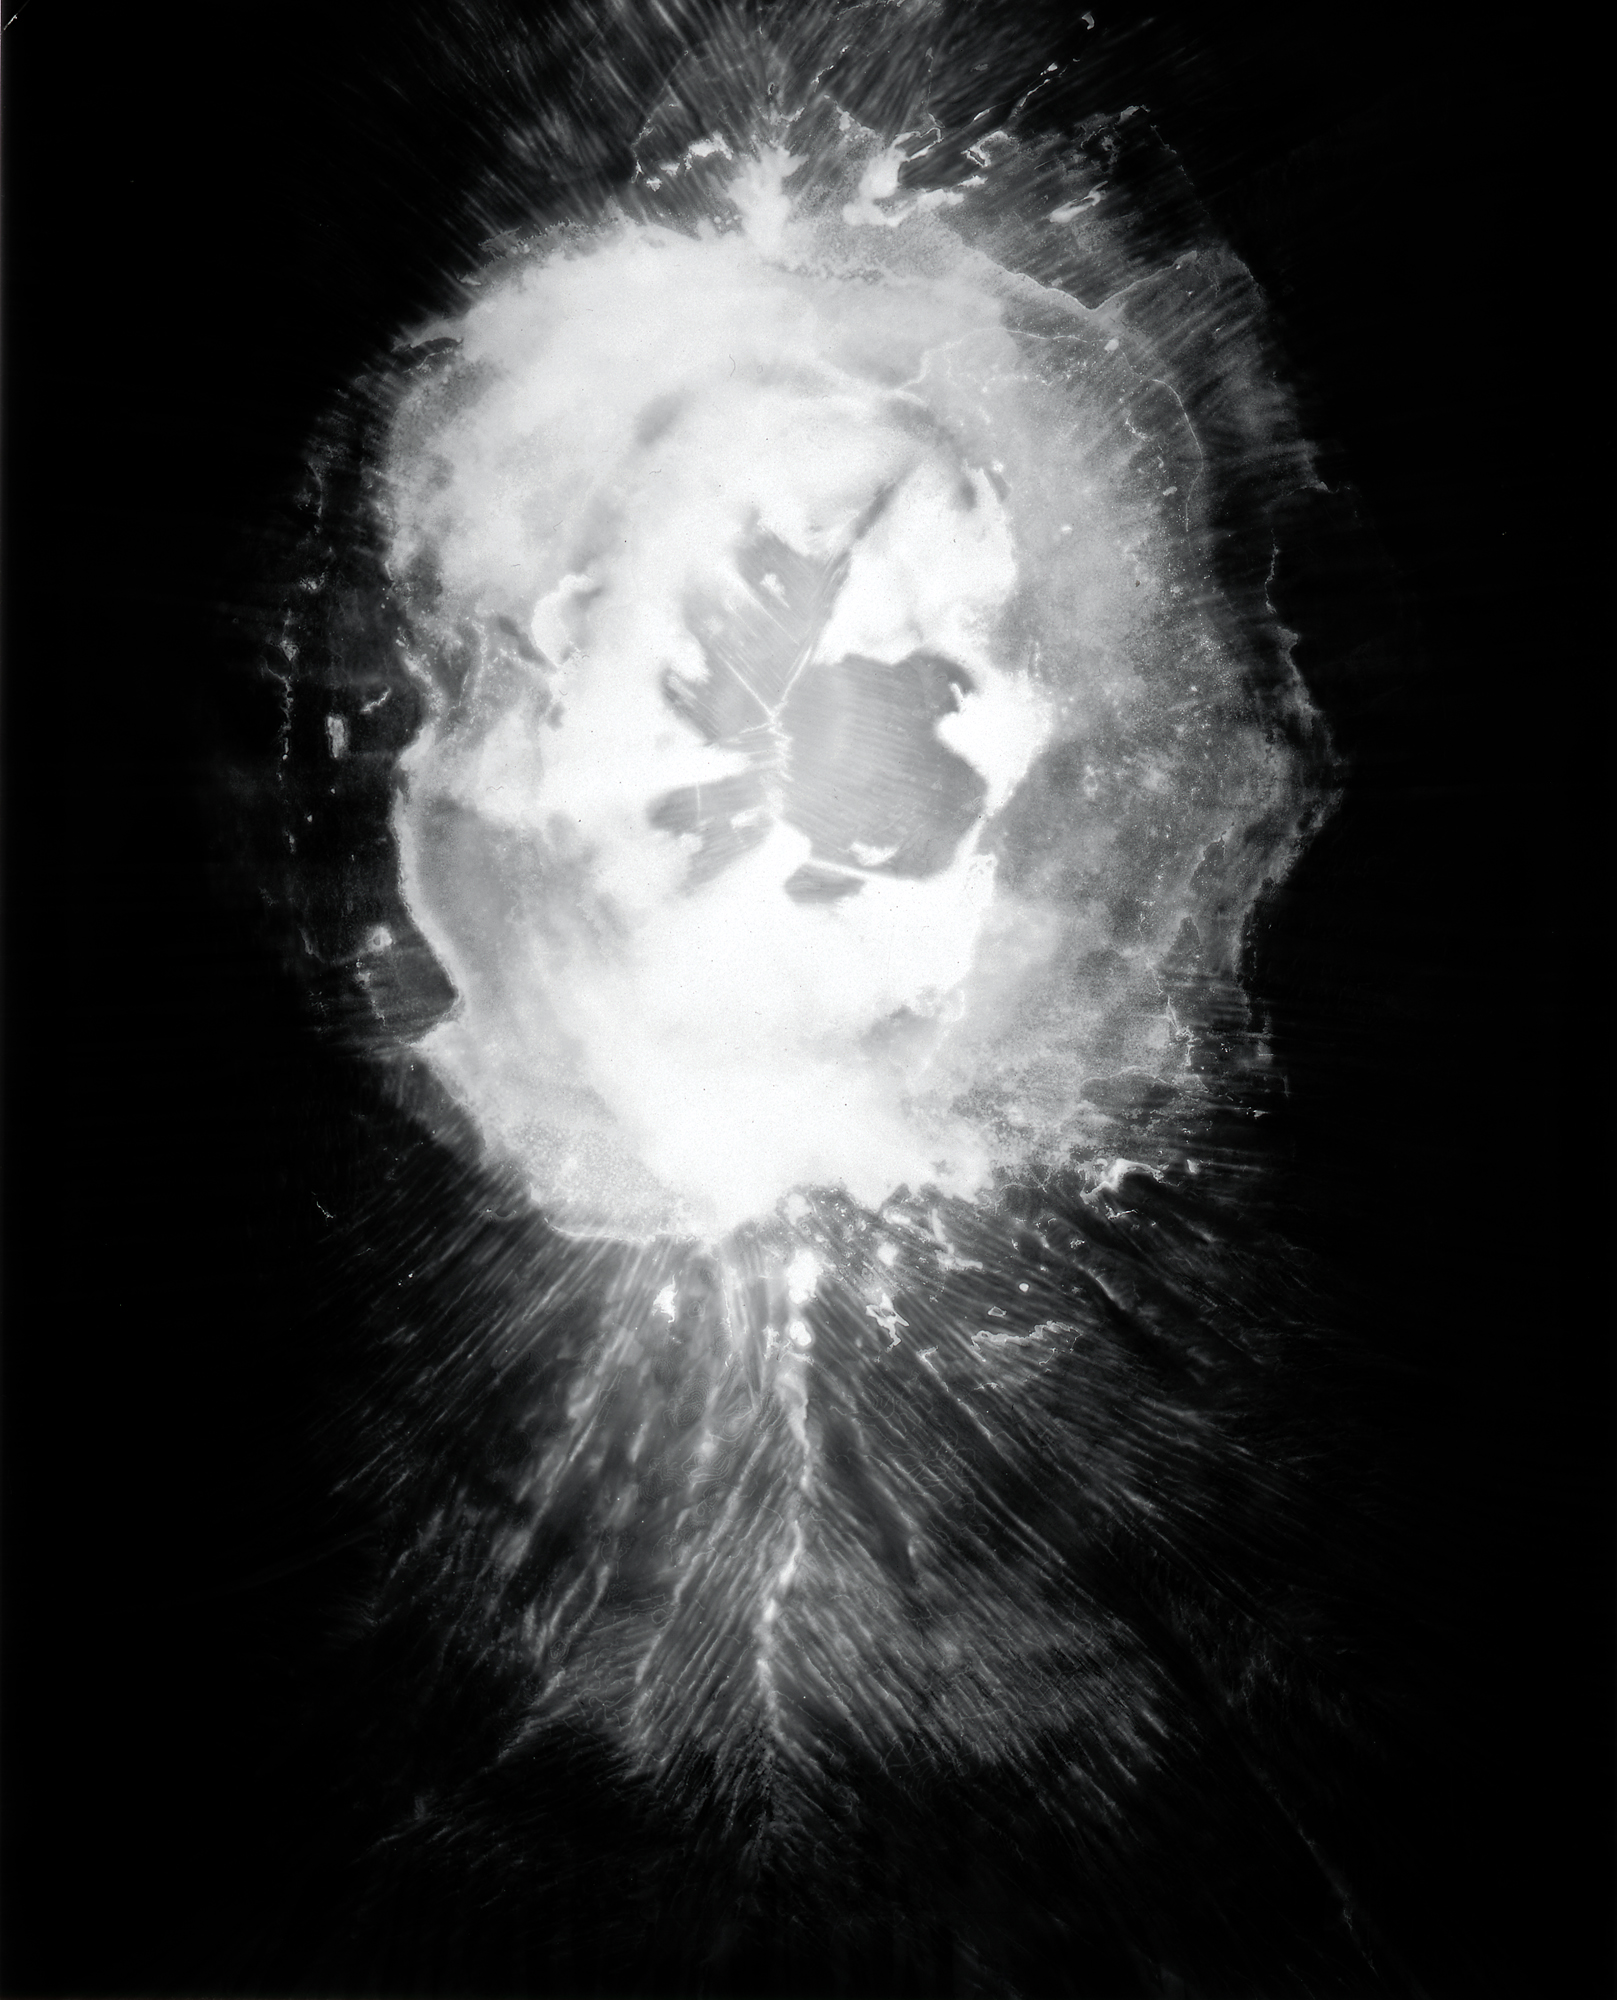 bw ice 1003.jpg